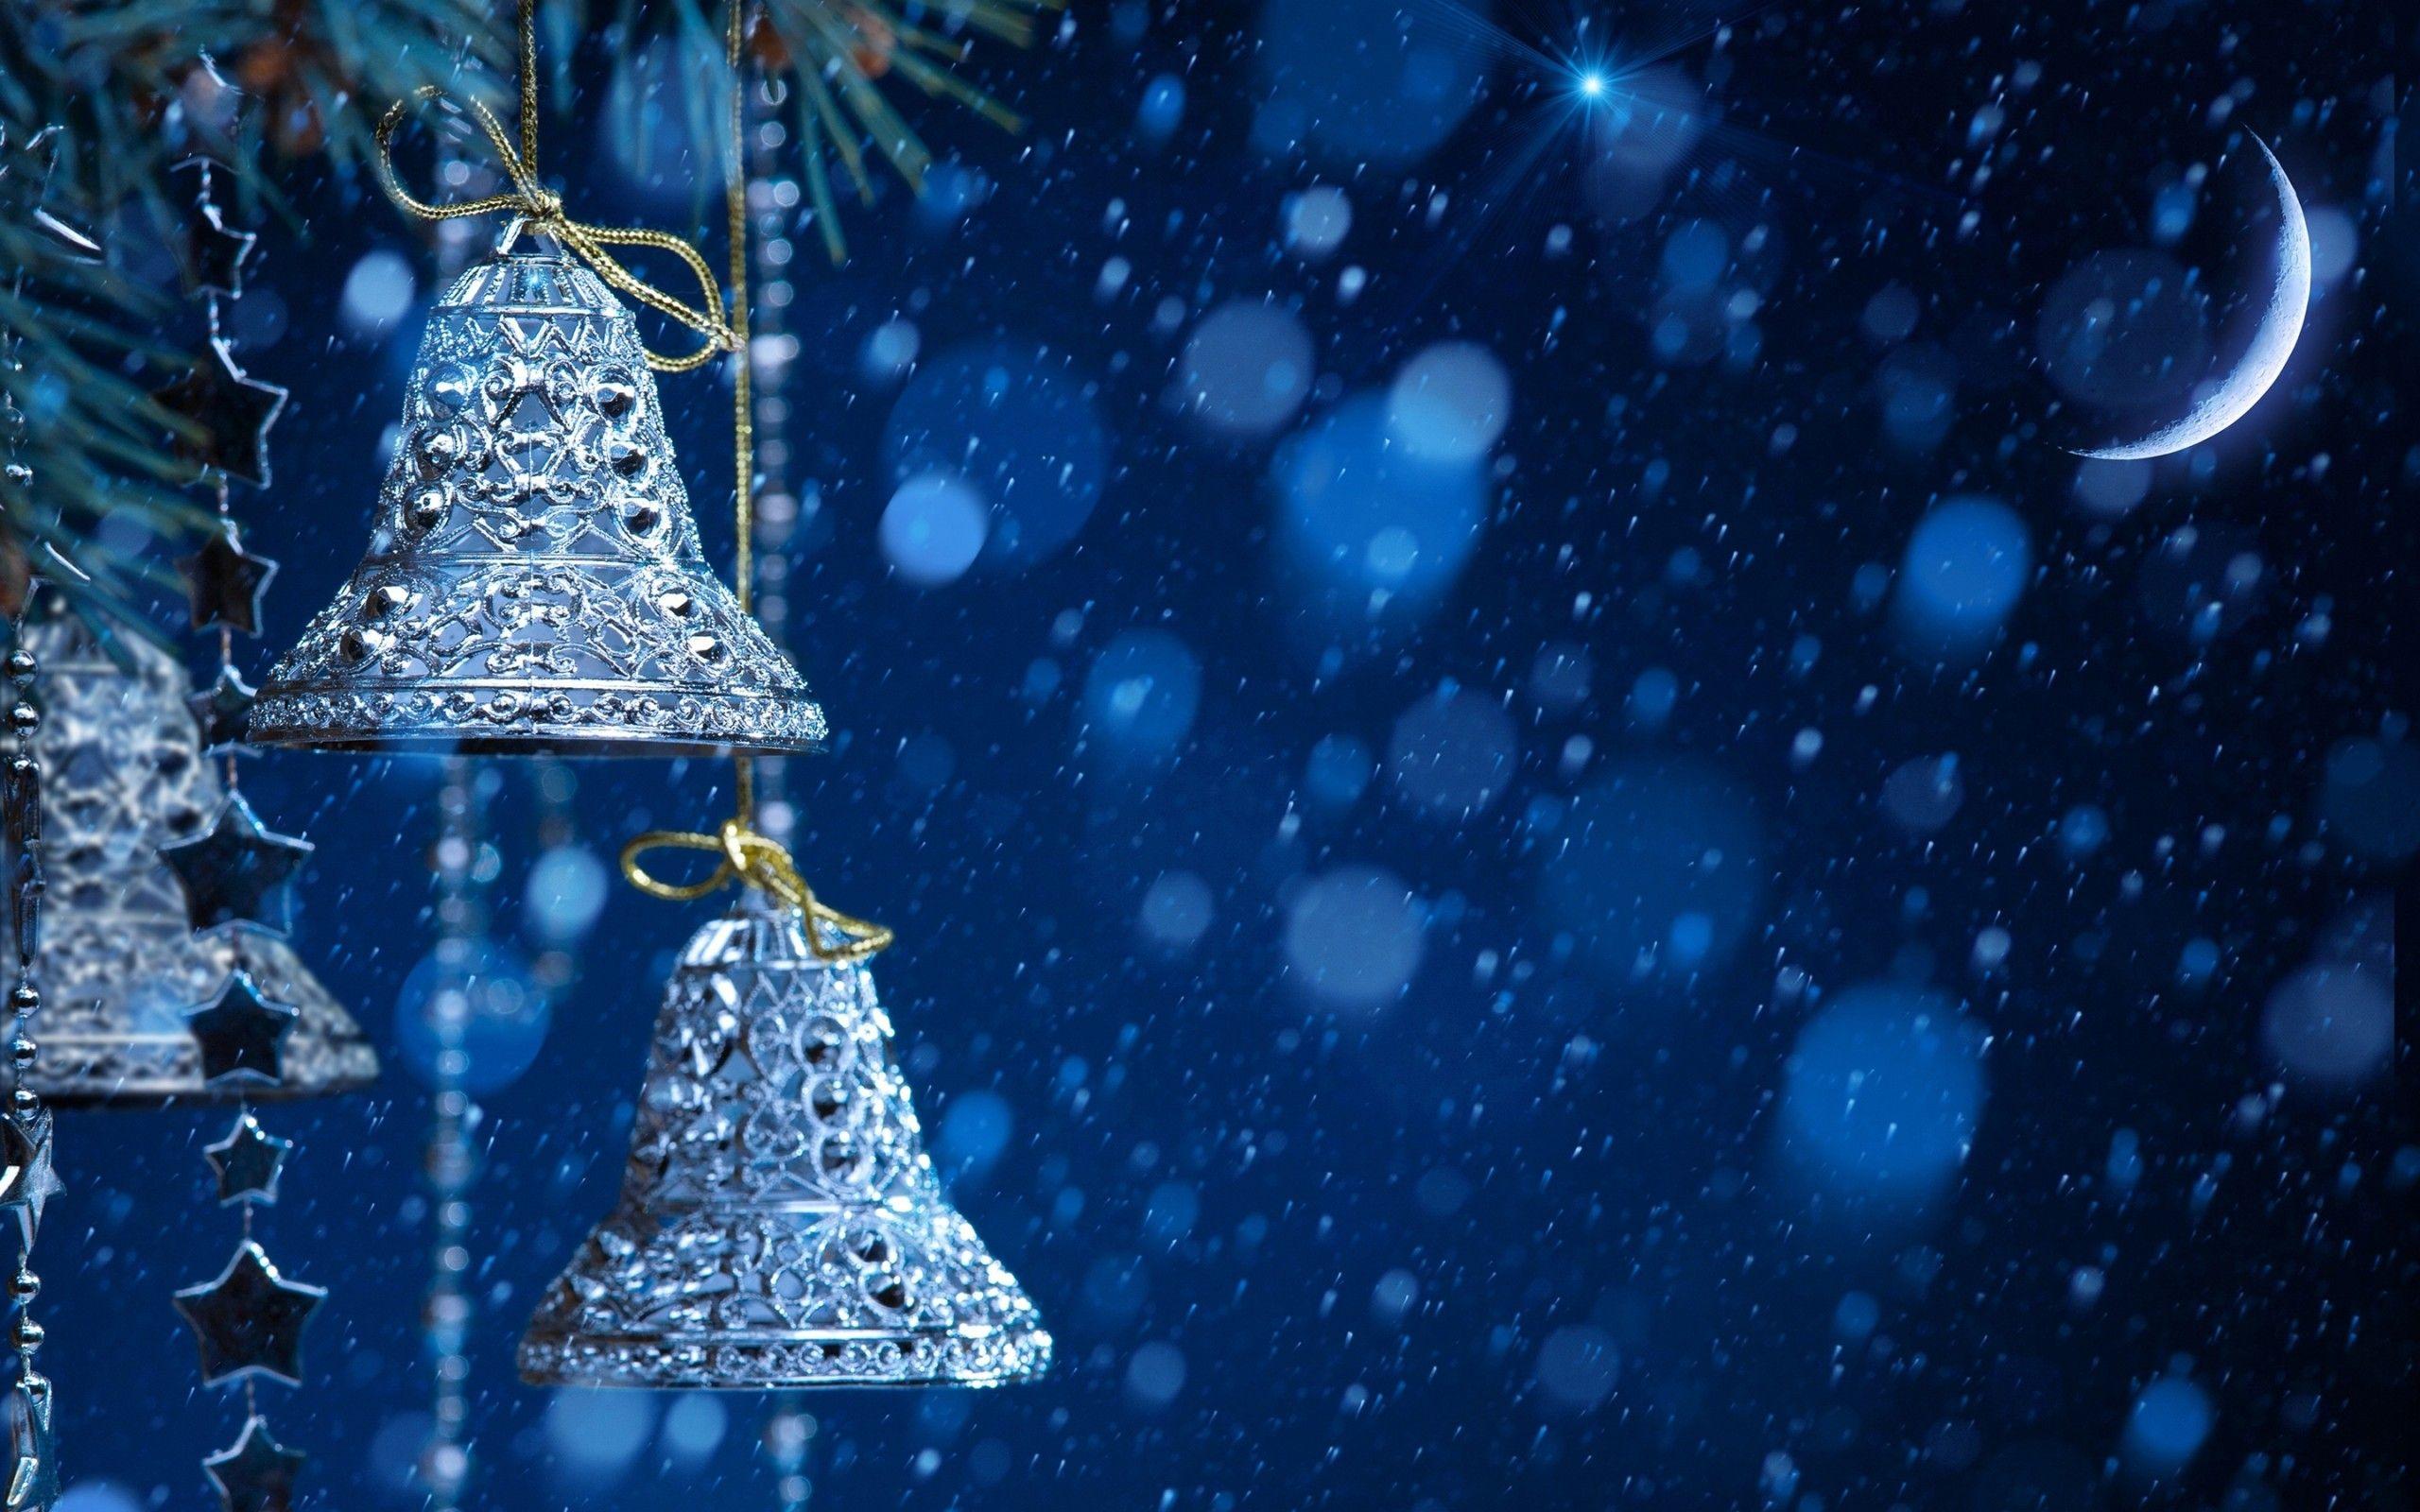 Christmas Scenes Google Search Christmas Wallpaper Christmas Wallpaper Backgrounds Christmas Bells